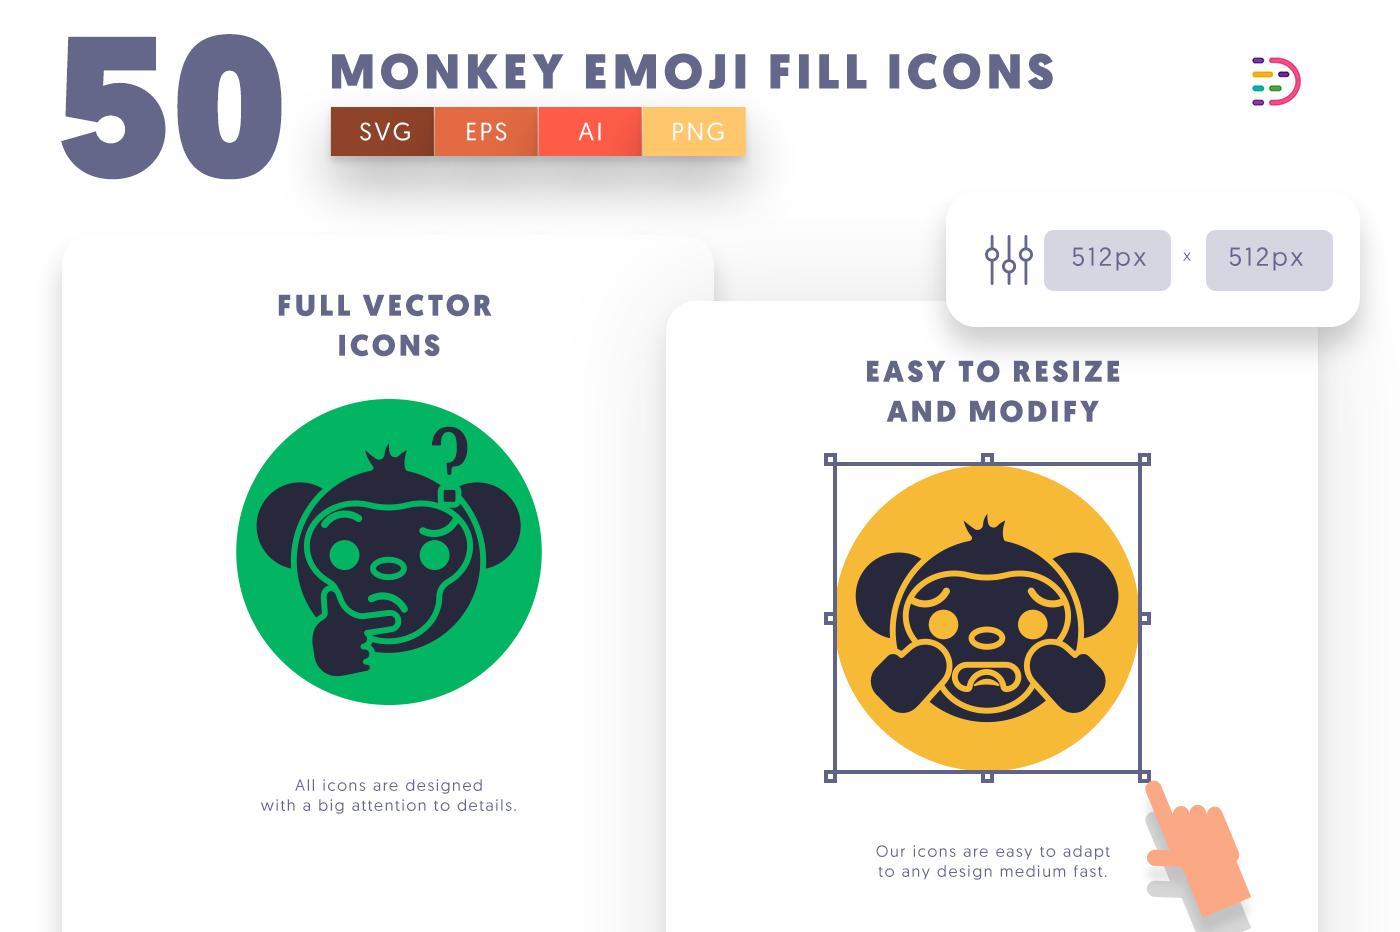 Full vector 50MonkeyEmojiFill Icons